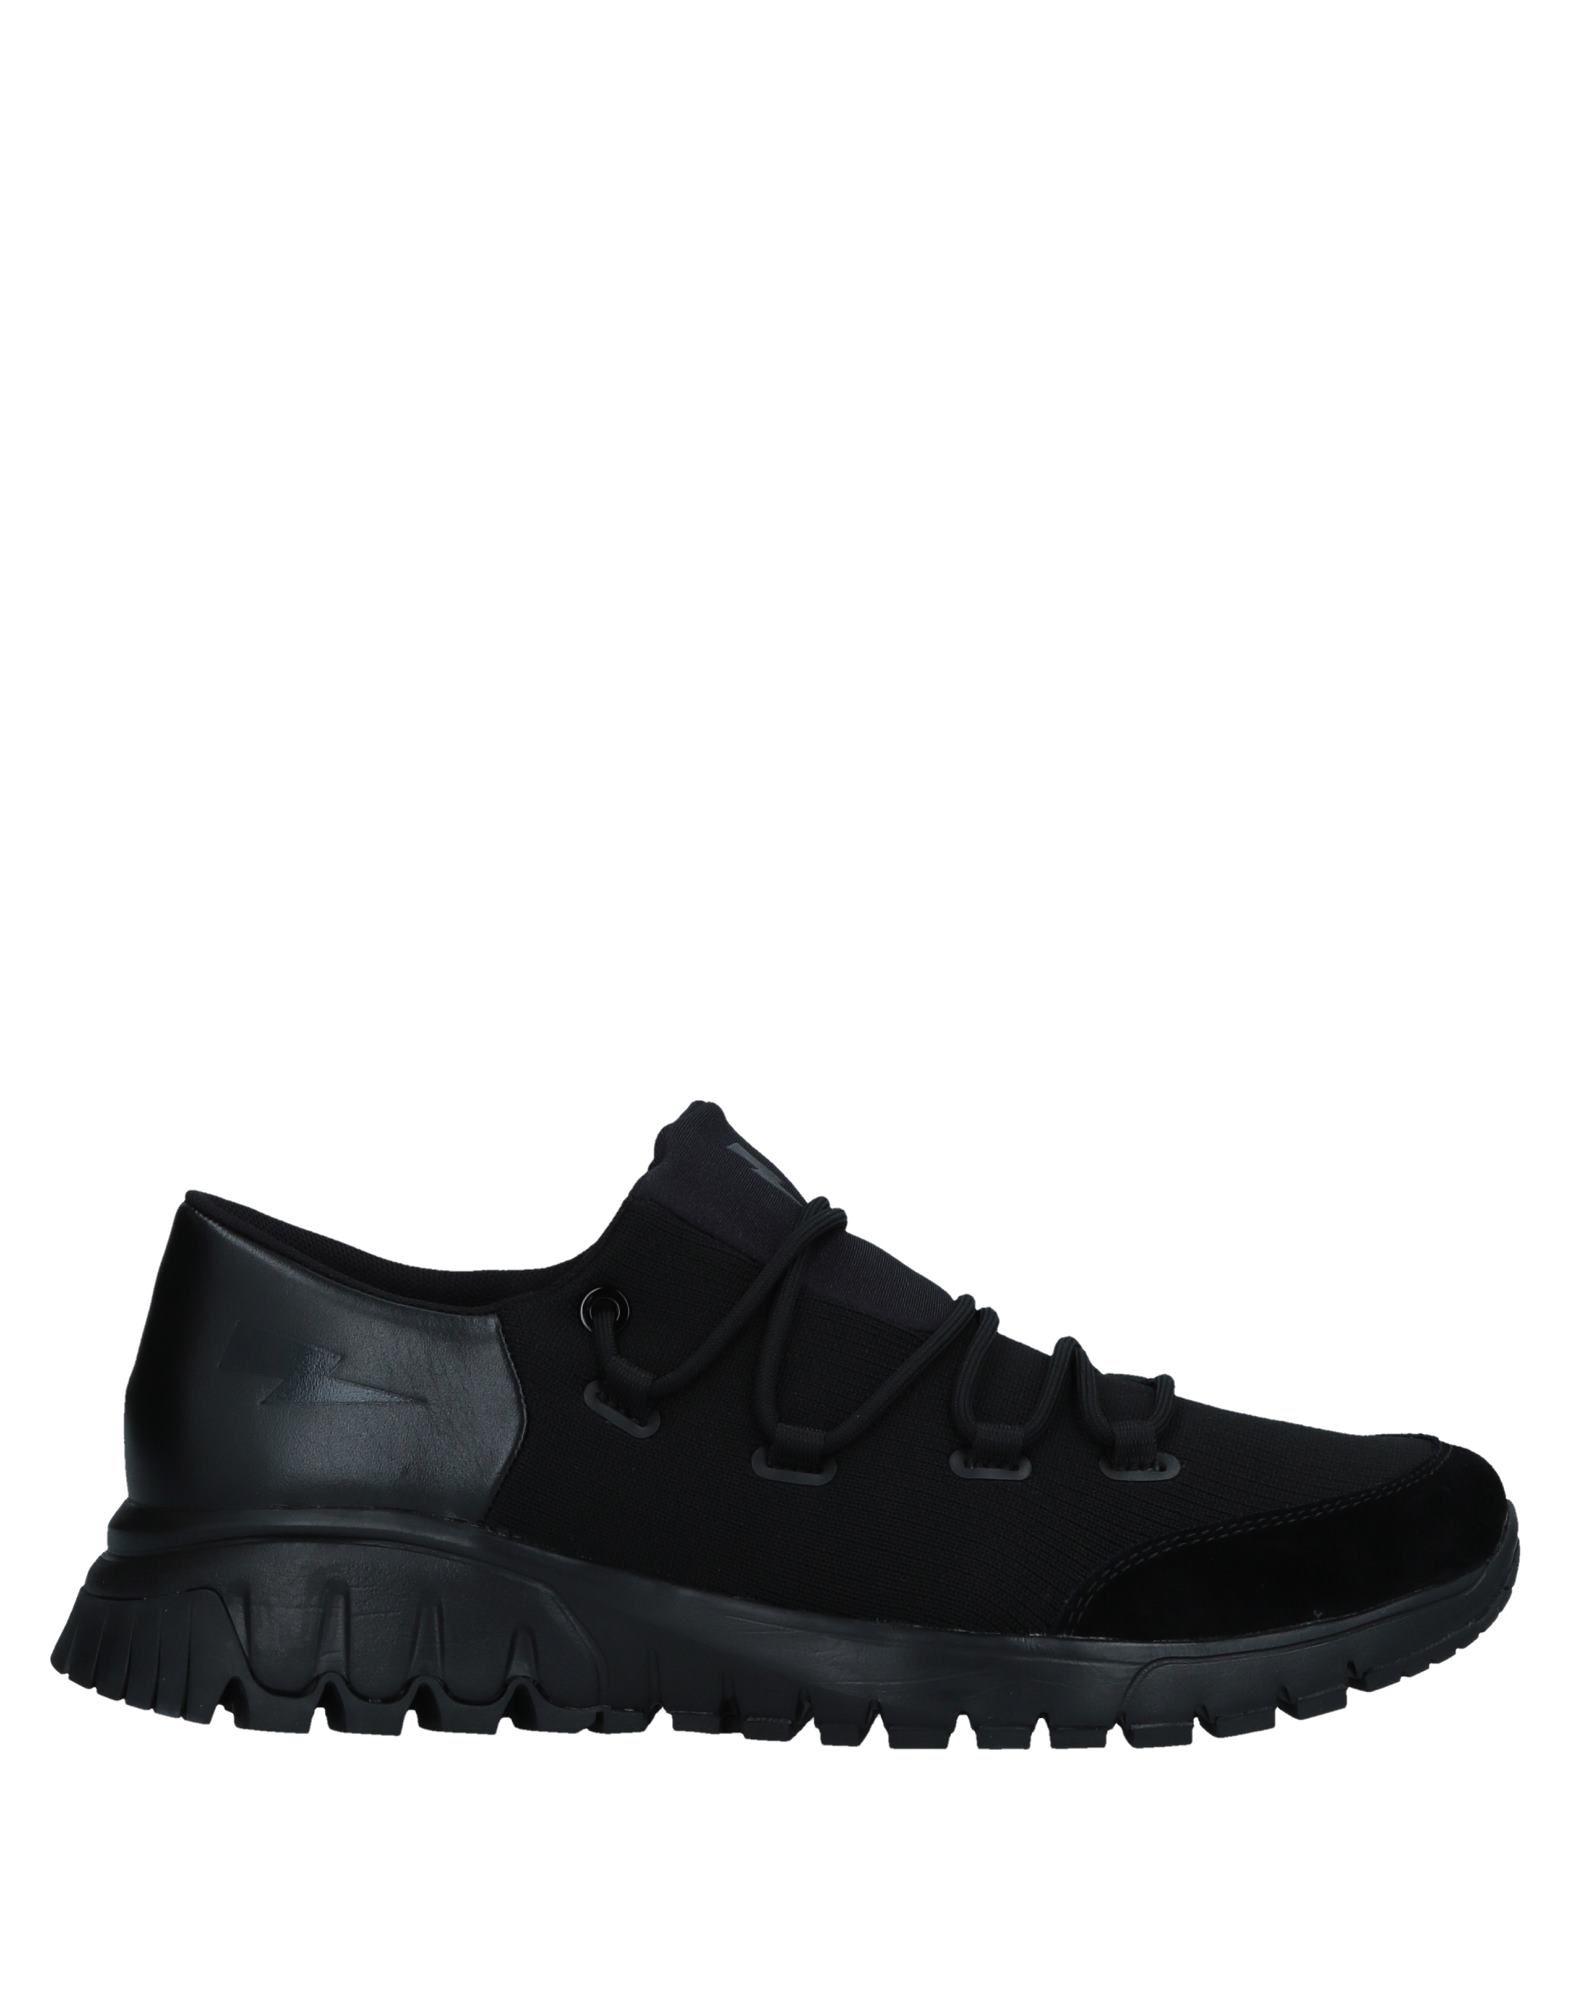 Neil Barrett Sneakers Herren  11528548BP Gute Qualität beliebte Schuhe